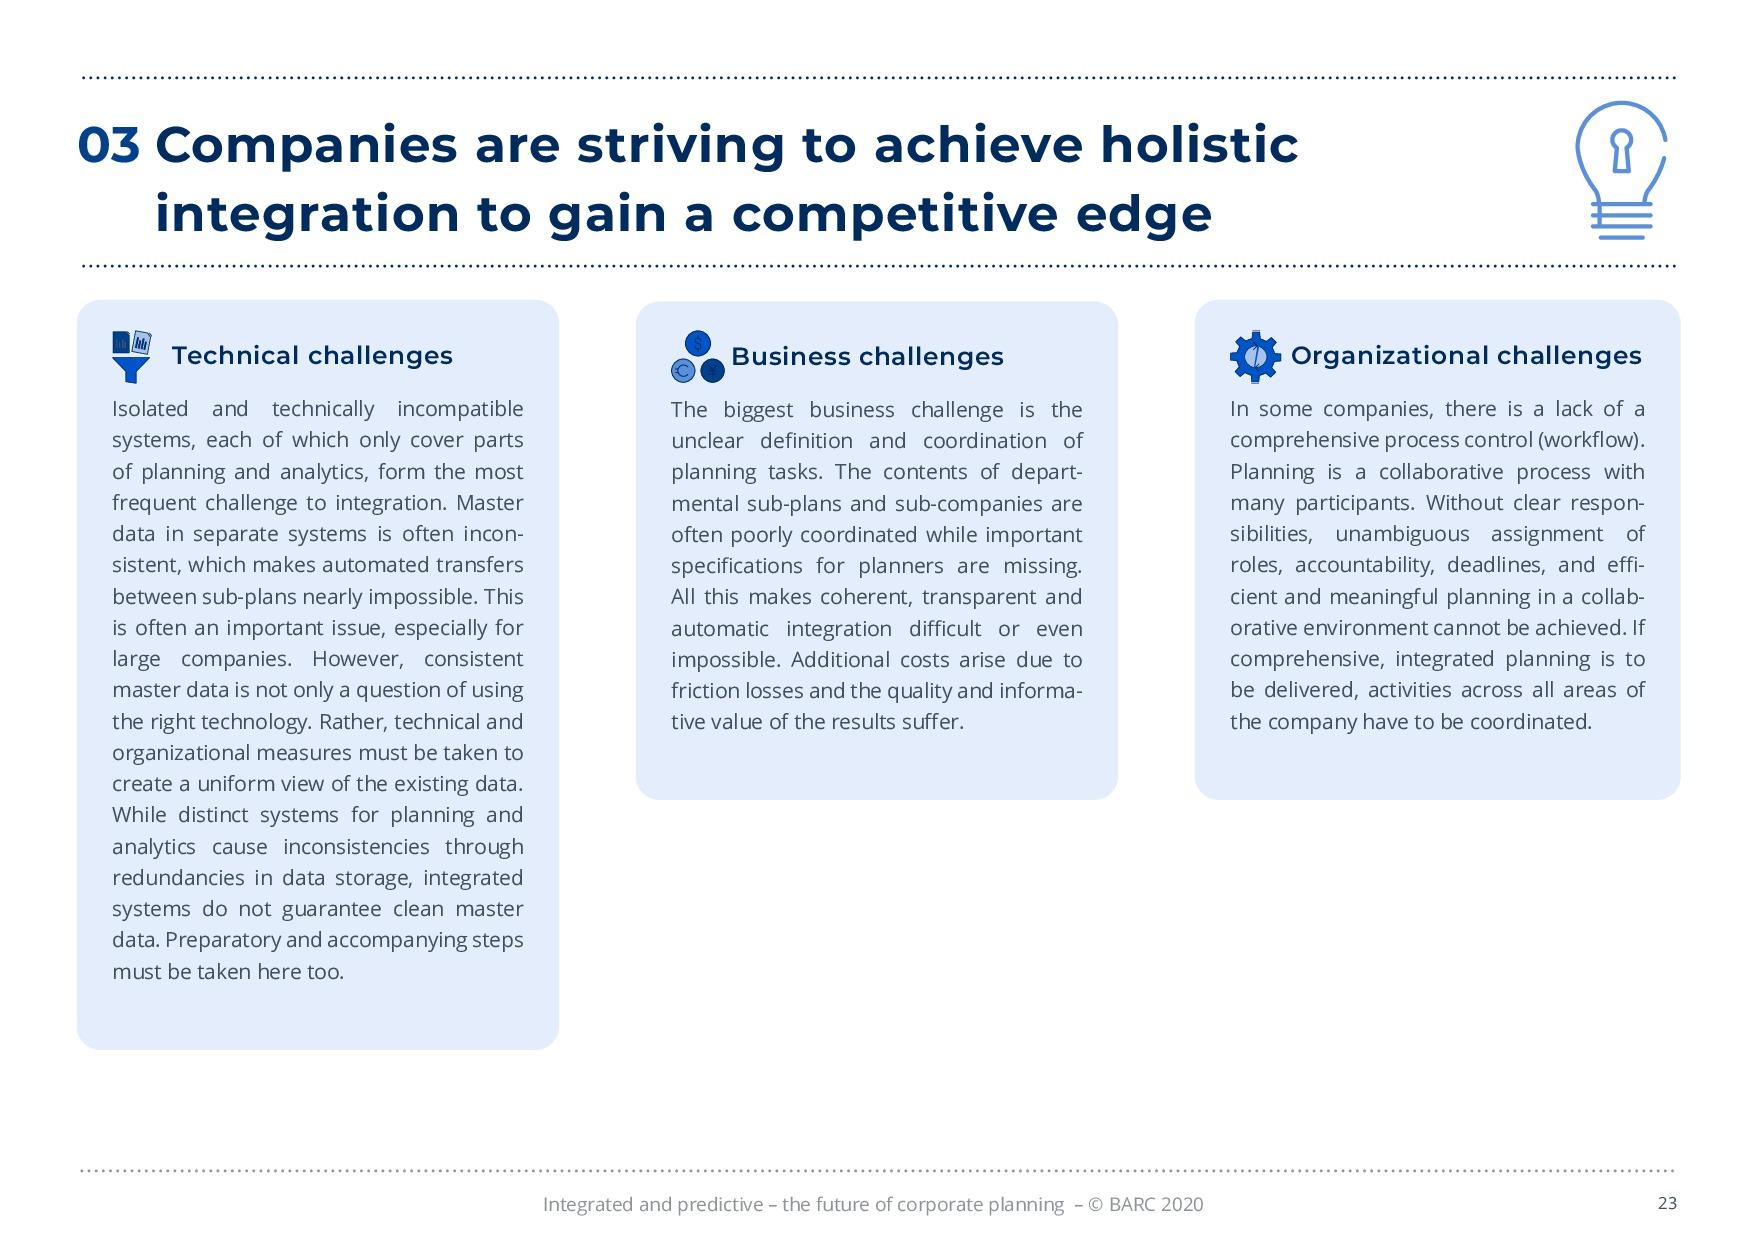 BARC – 統合と予測 – 経営計画の未来 | Page 23